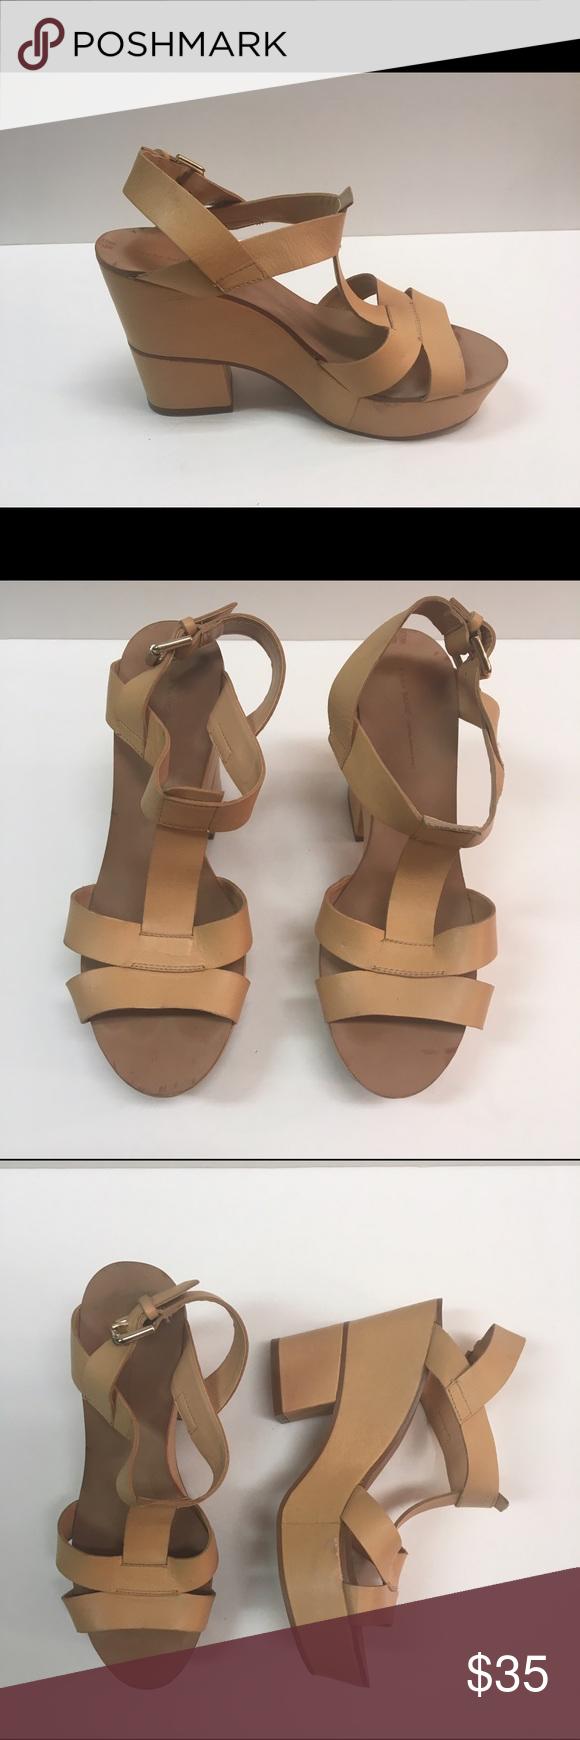 Sandals Zara 4 Heel Olxzuwpkit 2013 5 Inch Spring Summer Platform Basic CxBdero